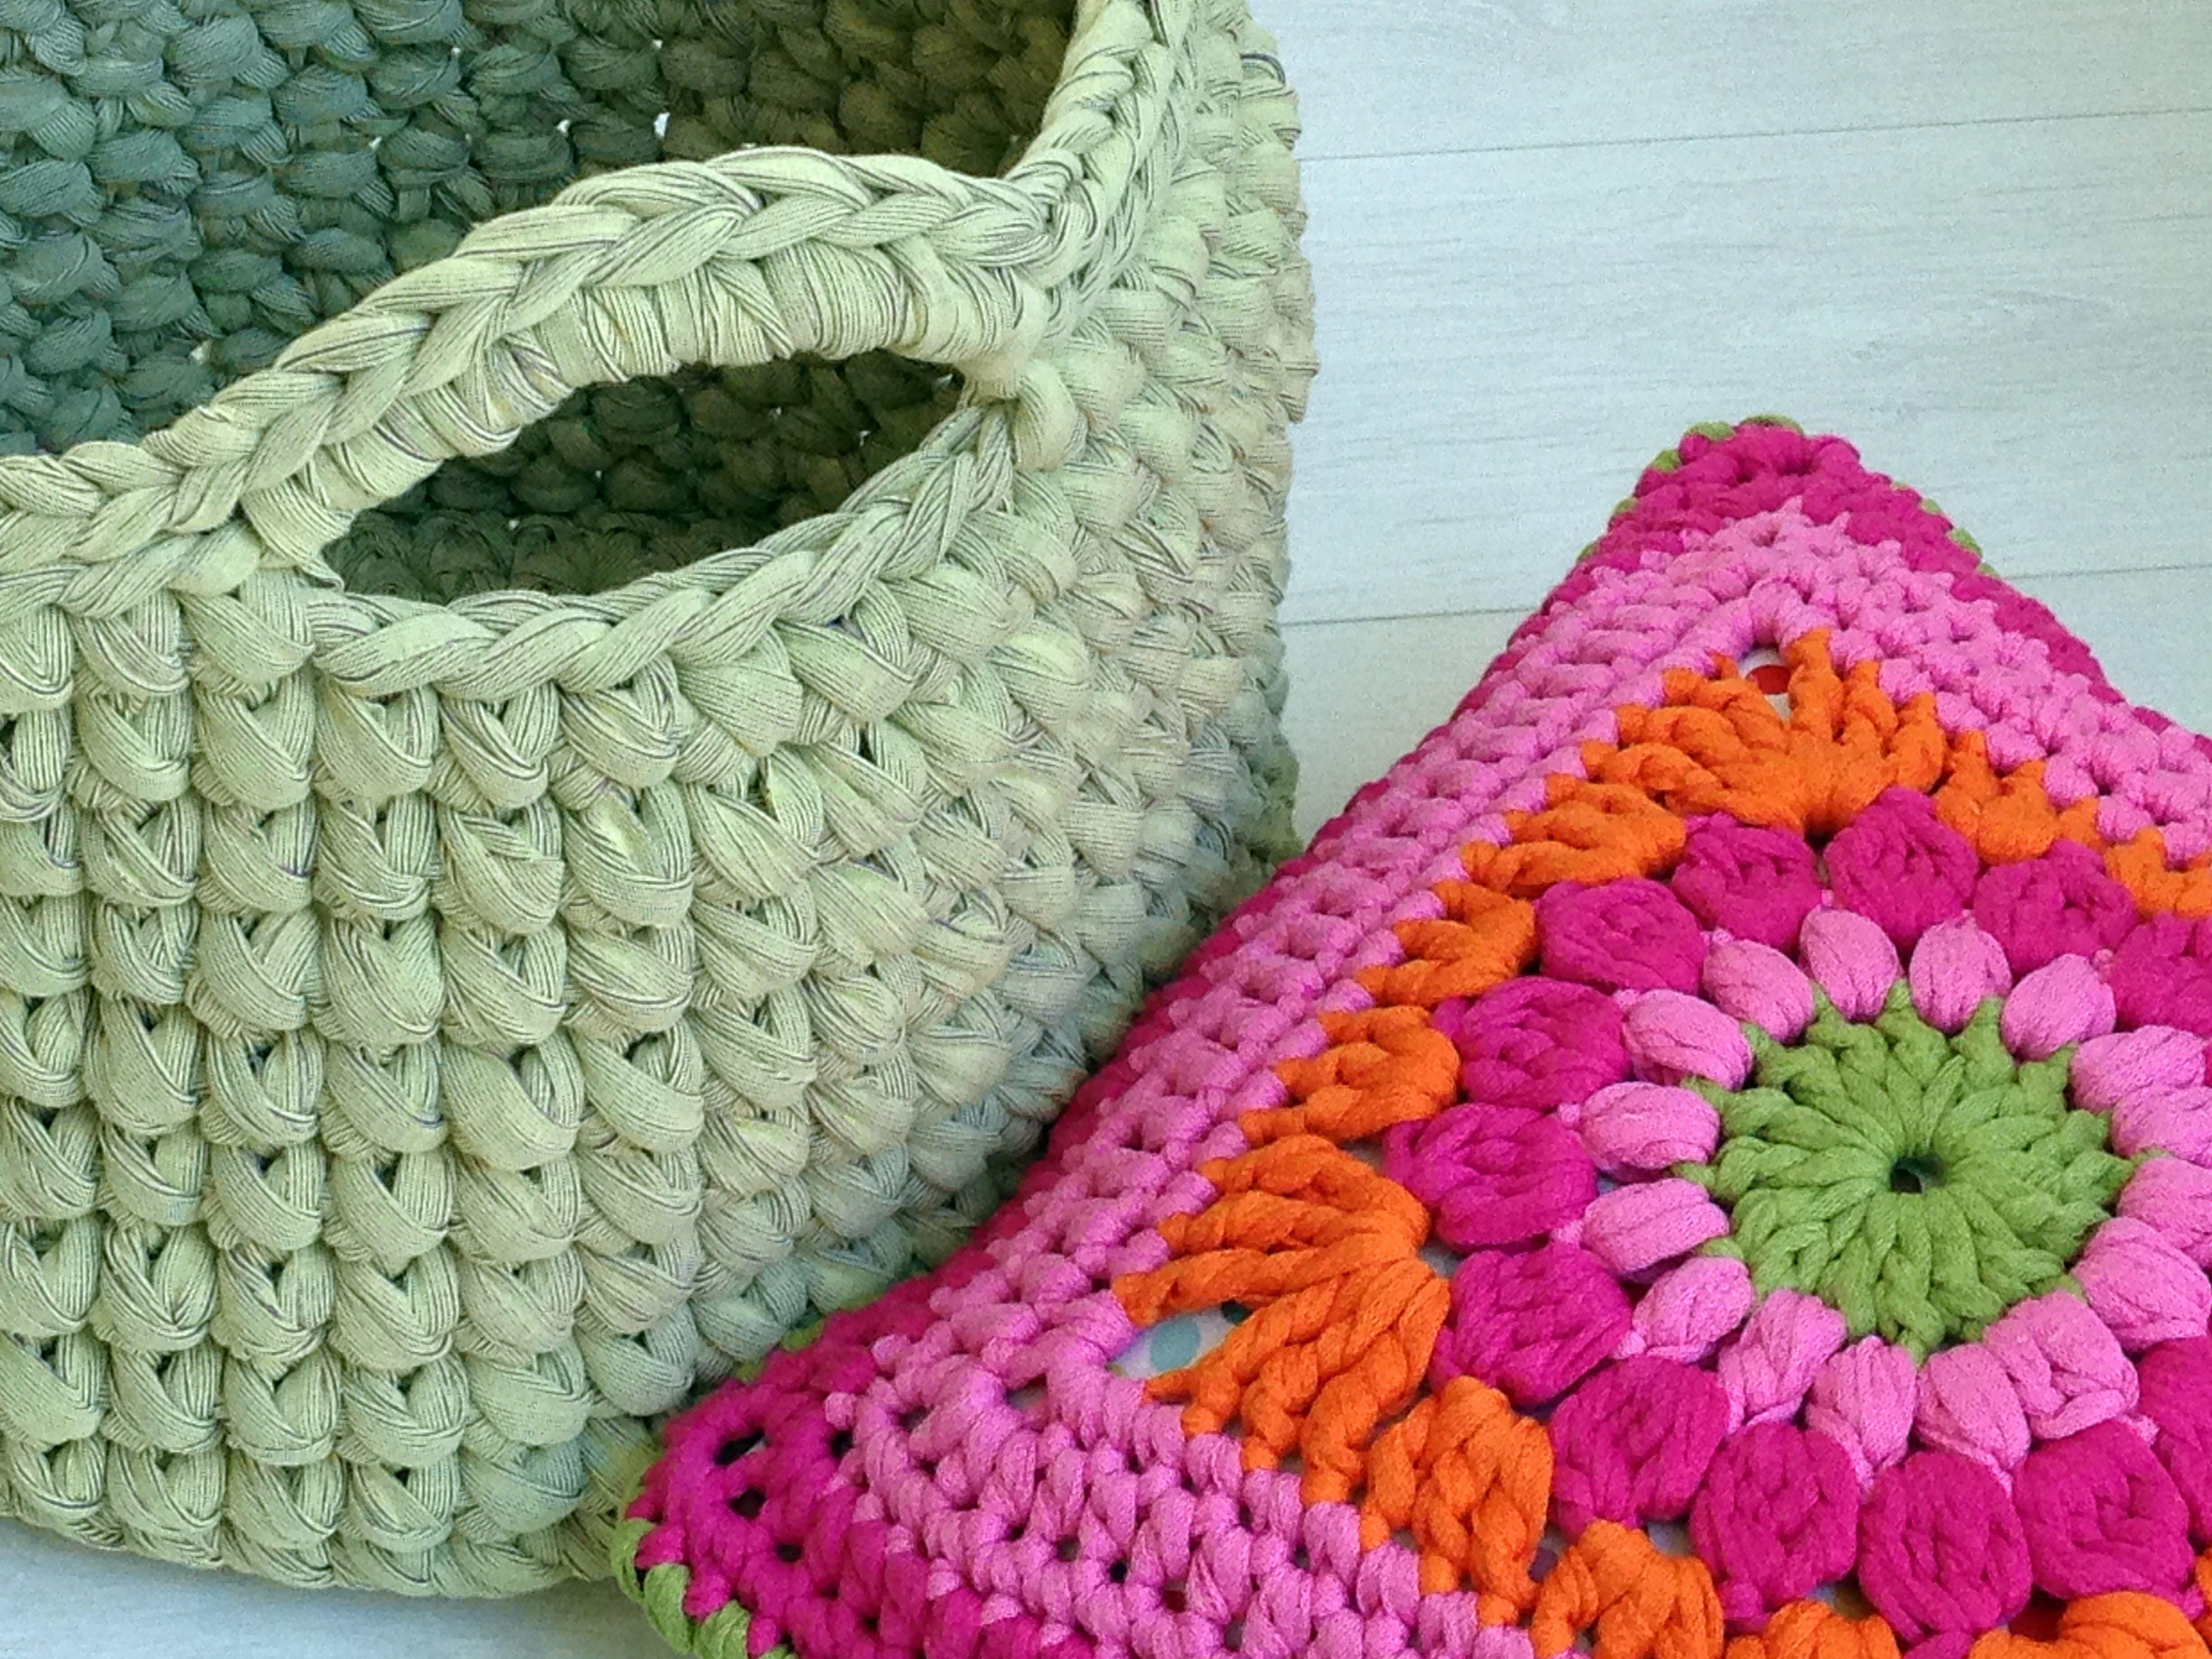 crochet basket & a crochet pillow from Katia Big Ribbon yarn tricot ...